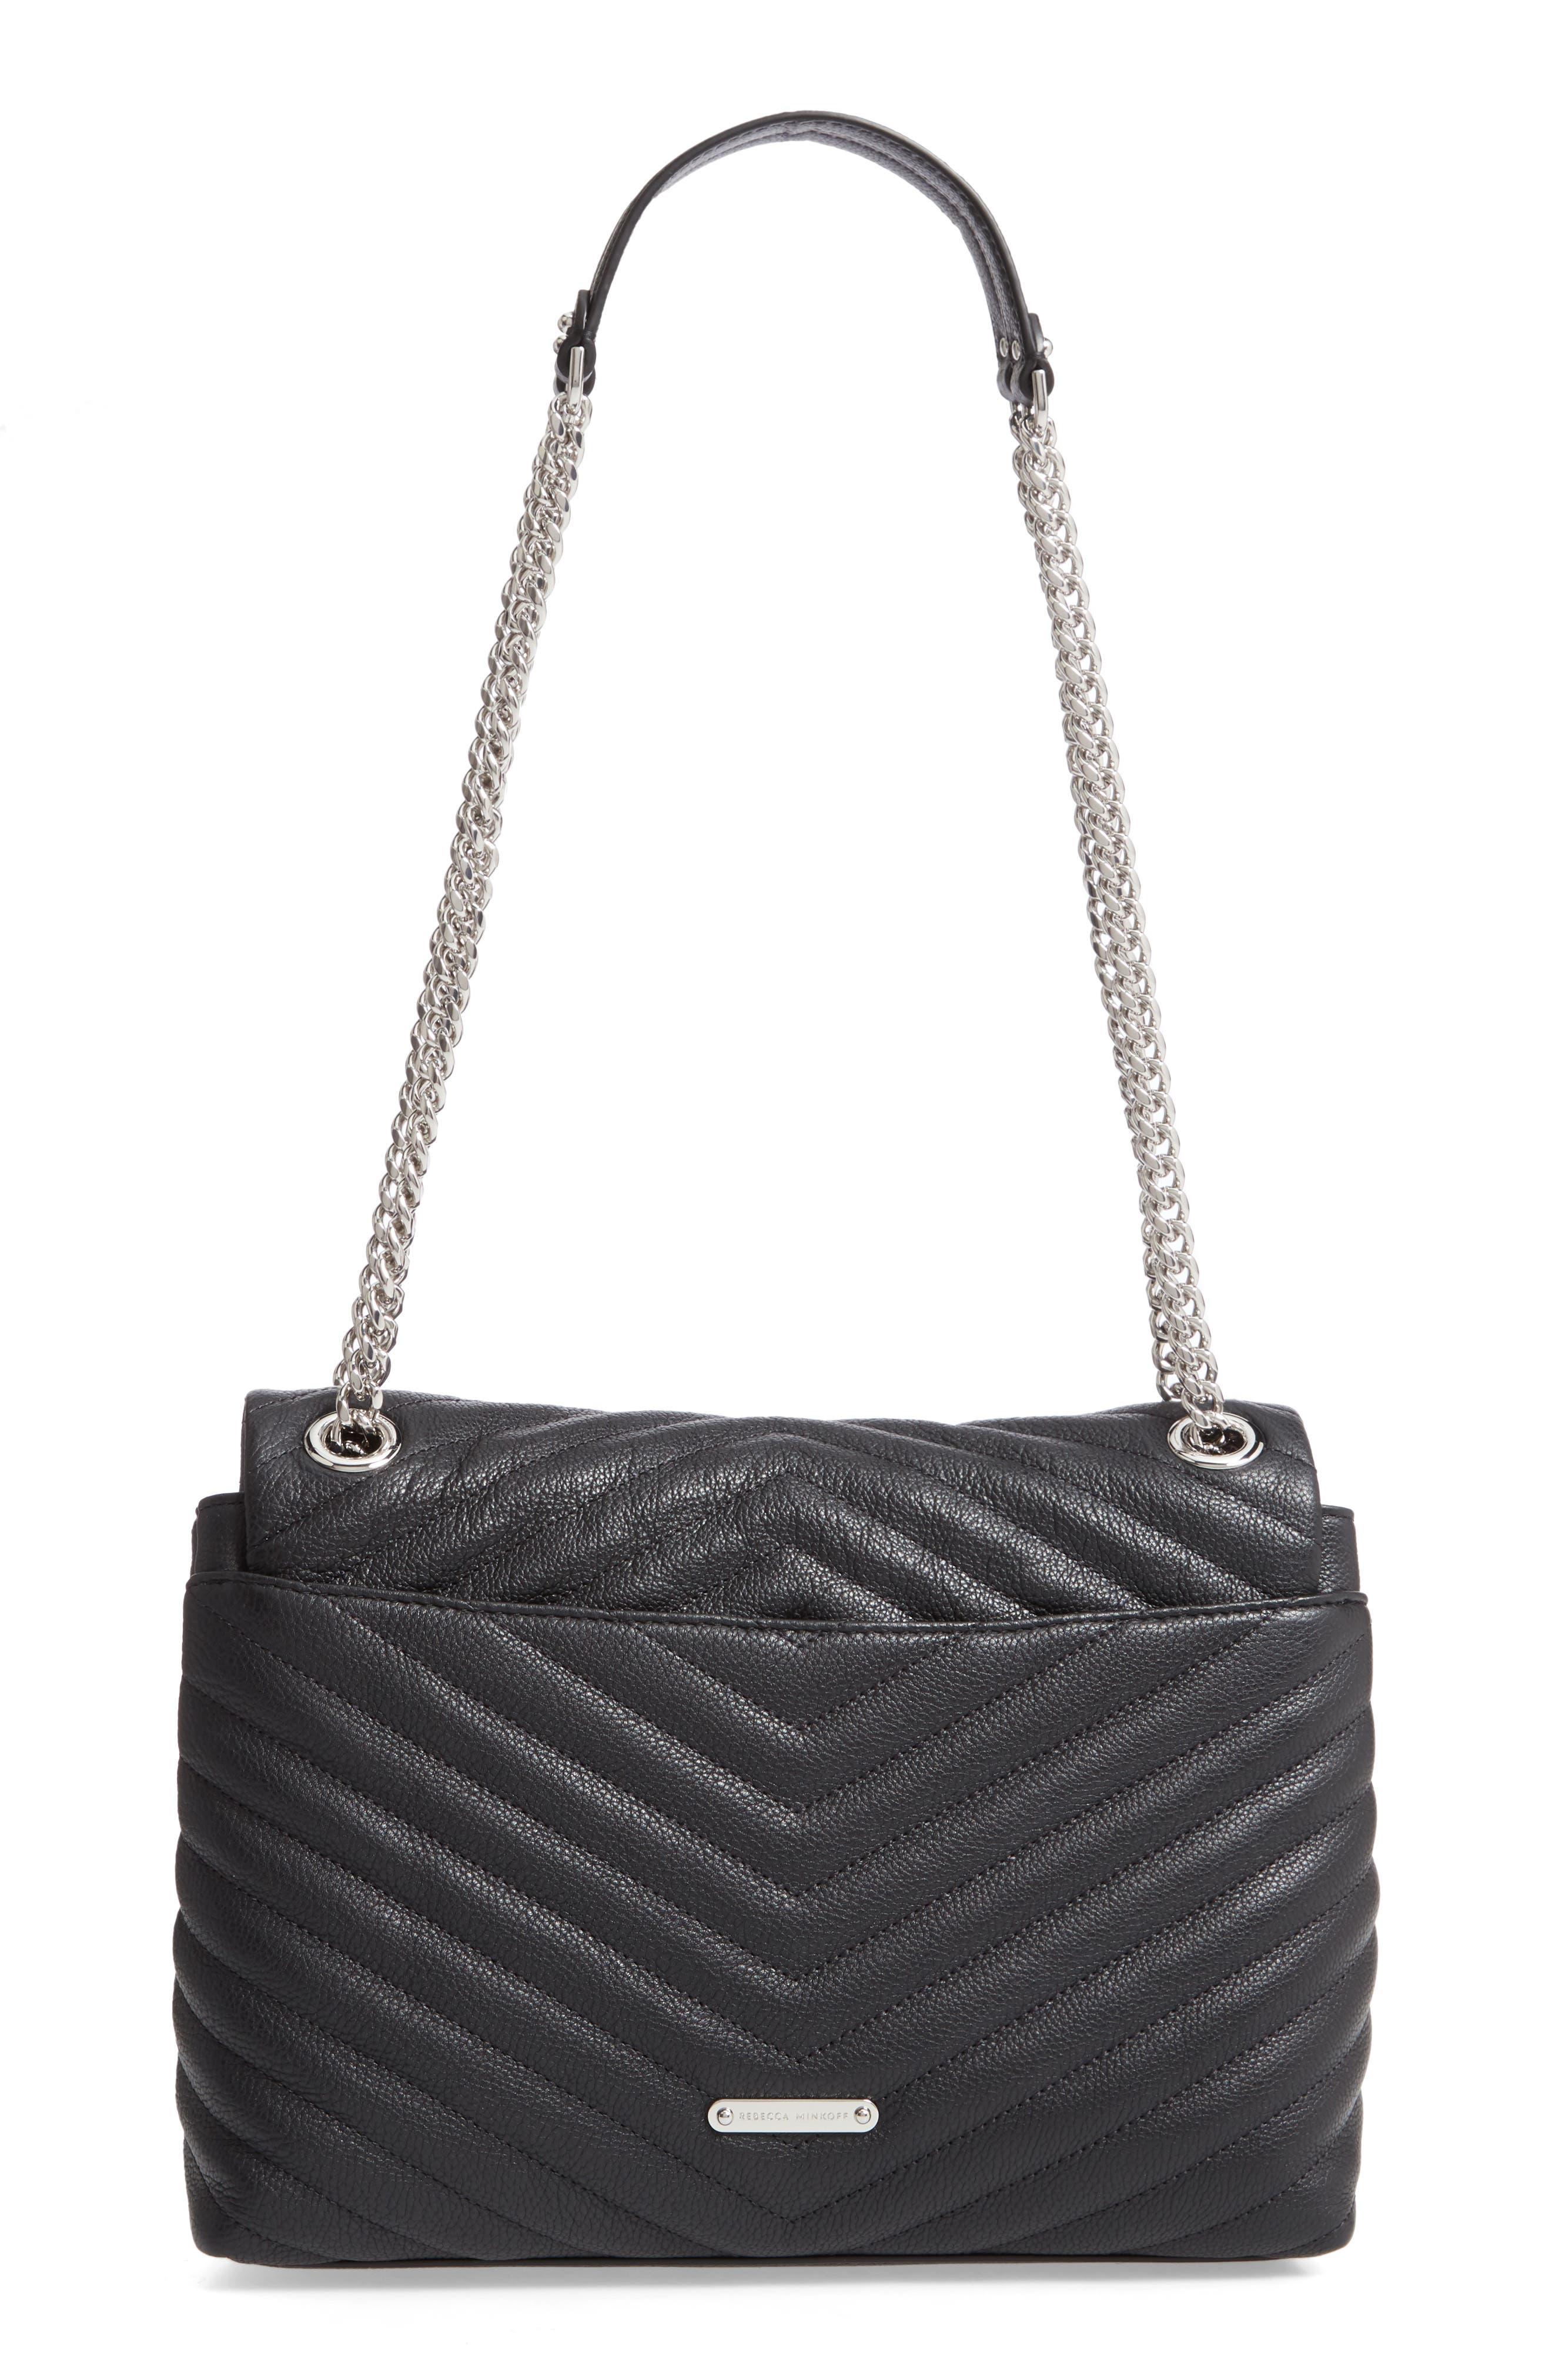 REBECCA MINKOFF, Edie Flap Quilted Leather Shoulder Bag, Alternate thumbnail 4, color, BLACK